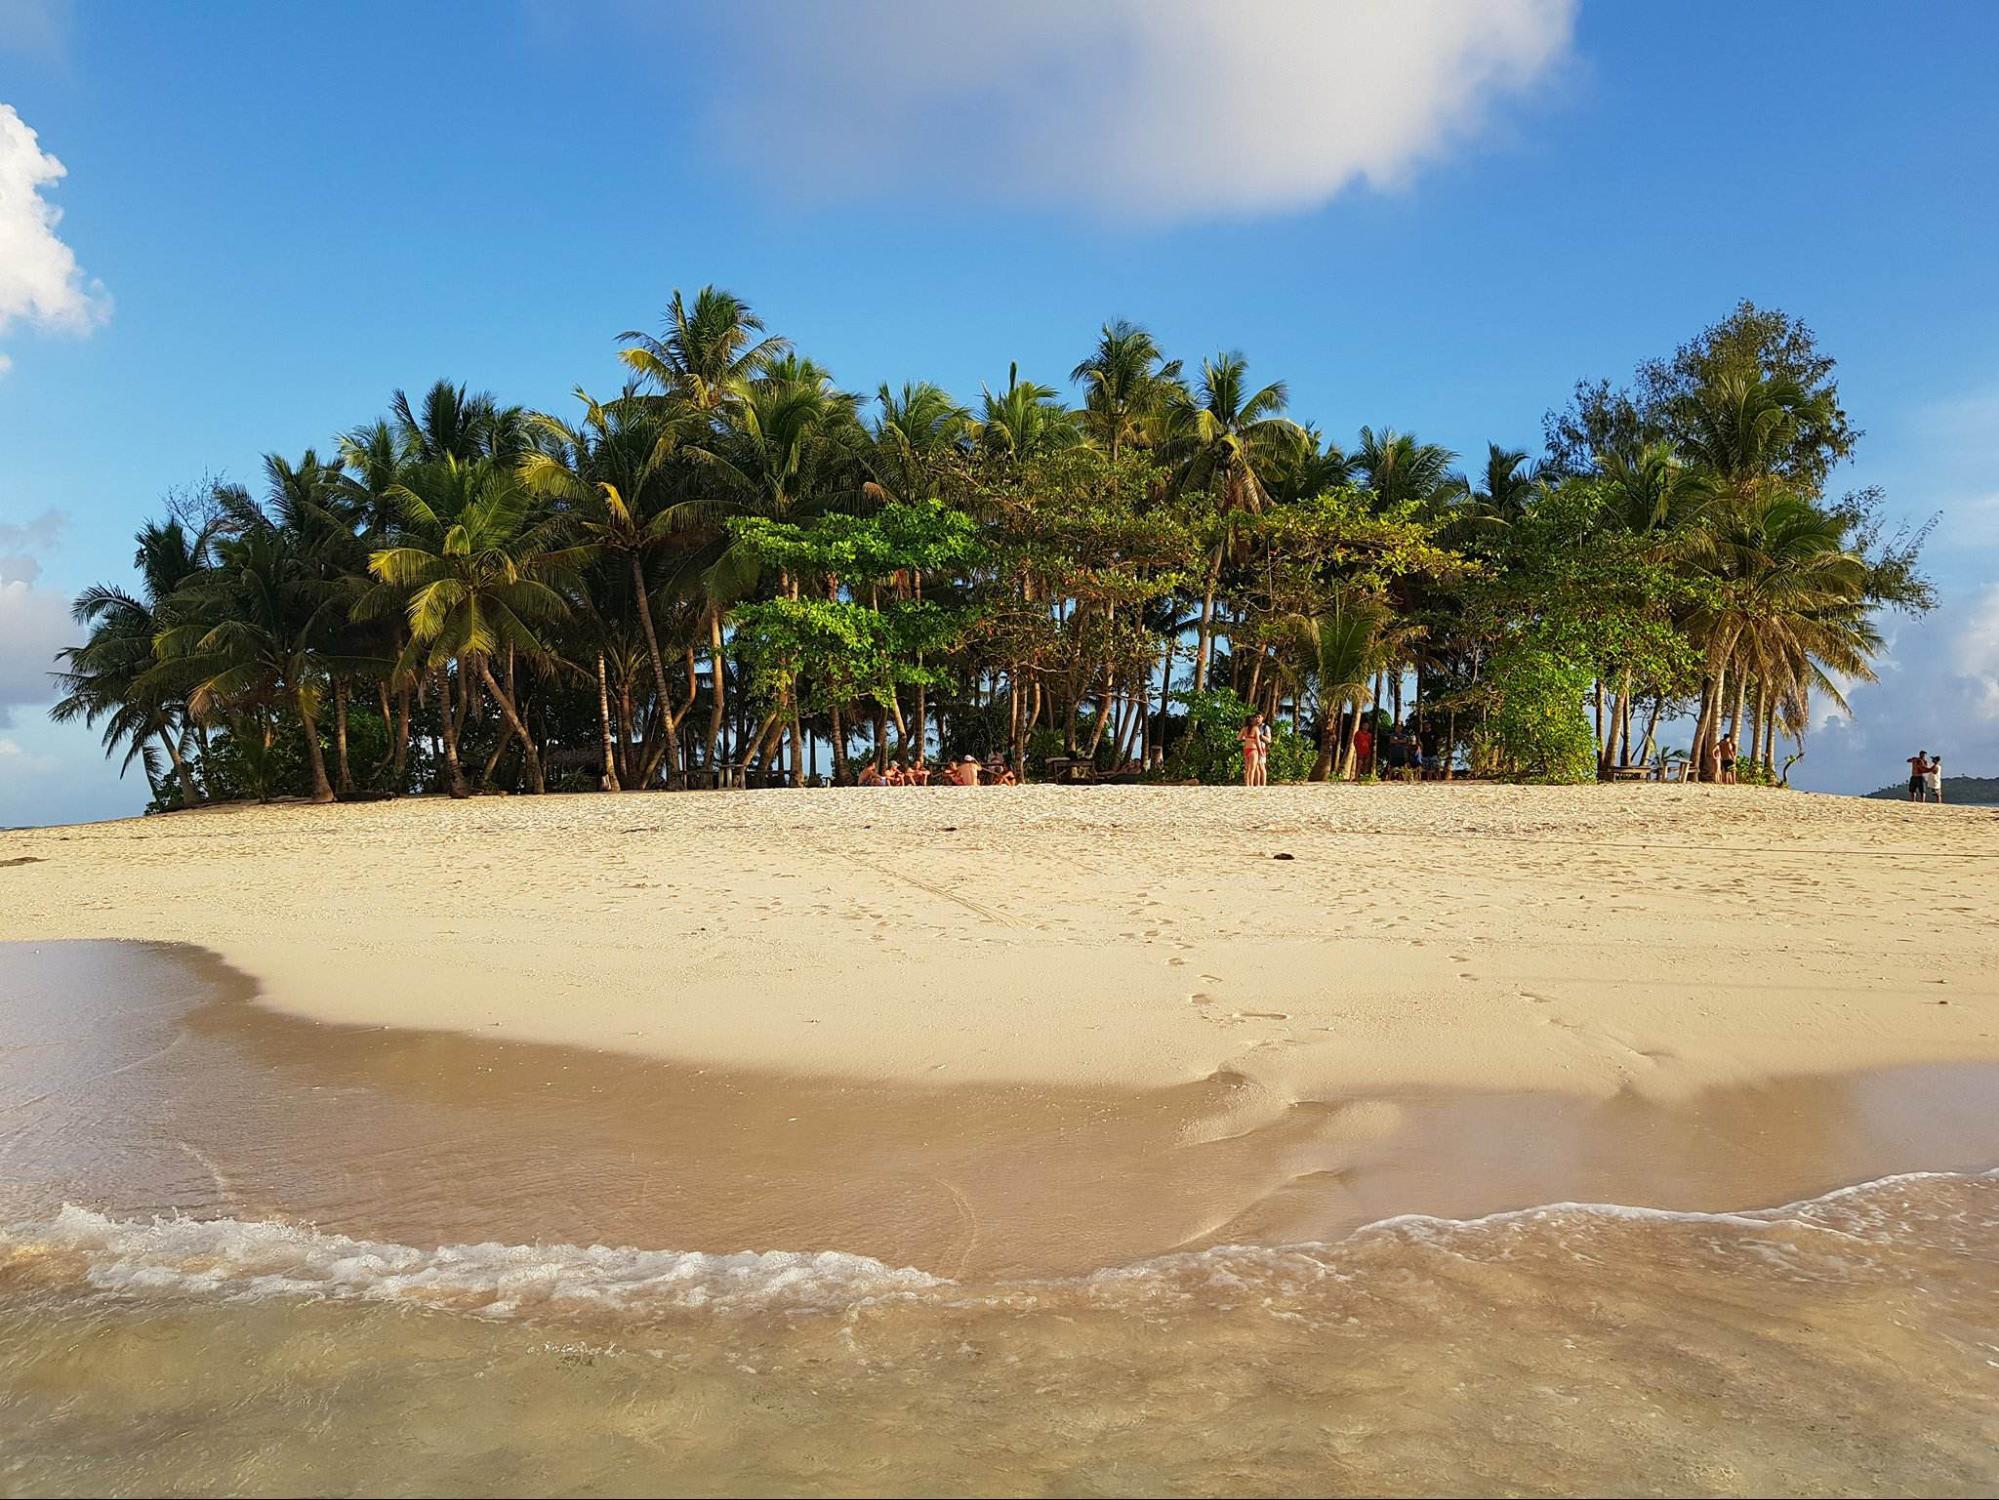 guyam island siargao philippines island